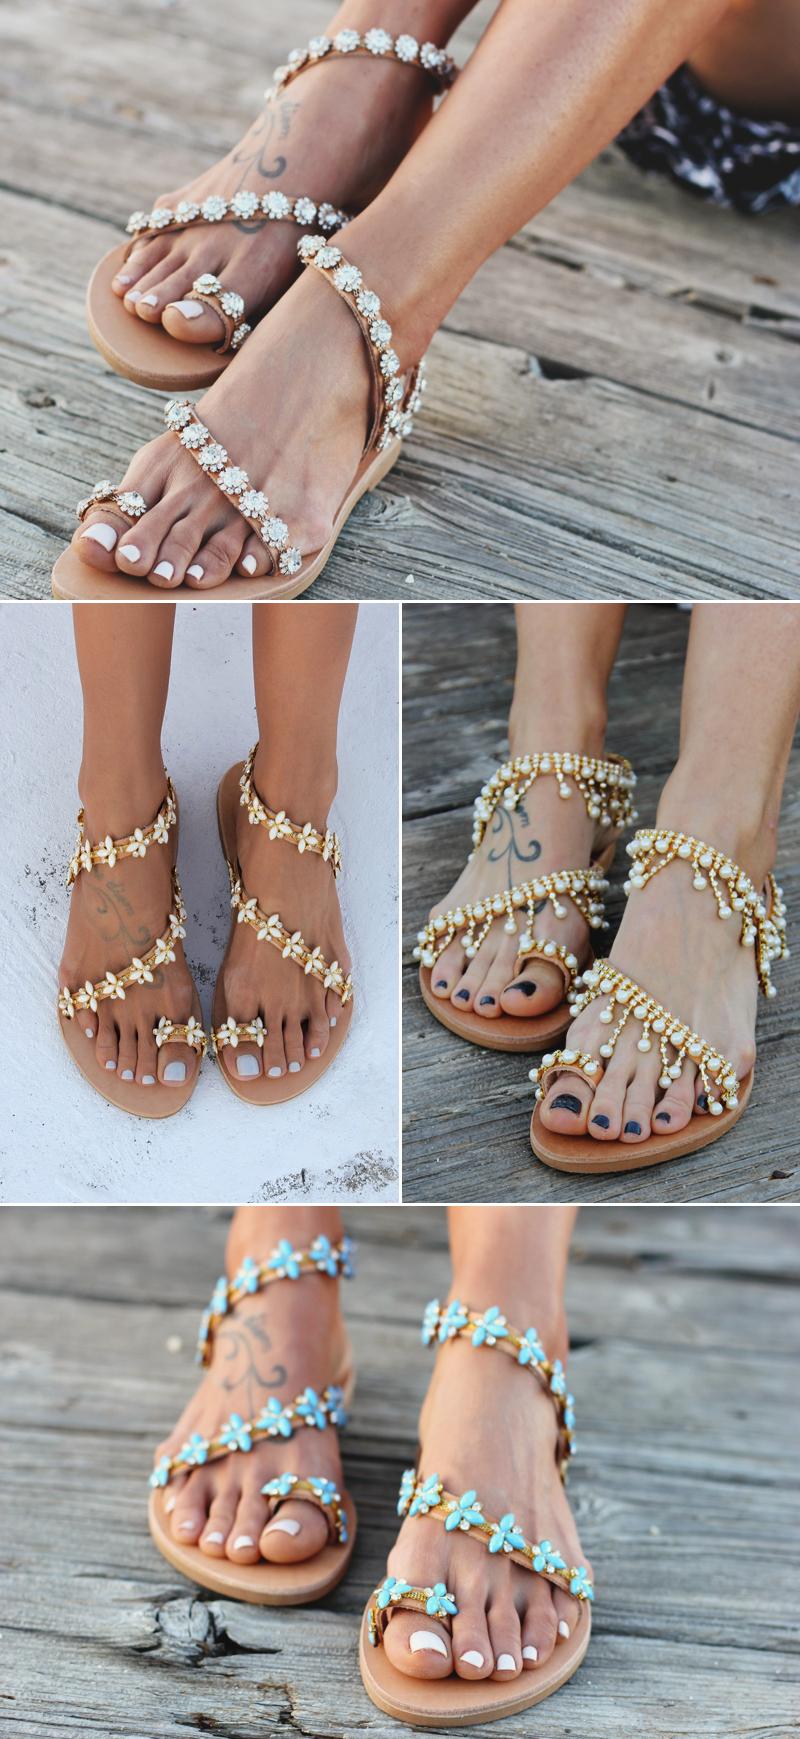 beachshoes06-DimitrasWorkshop